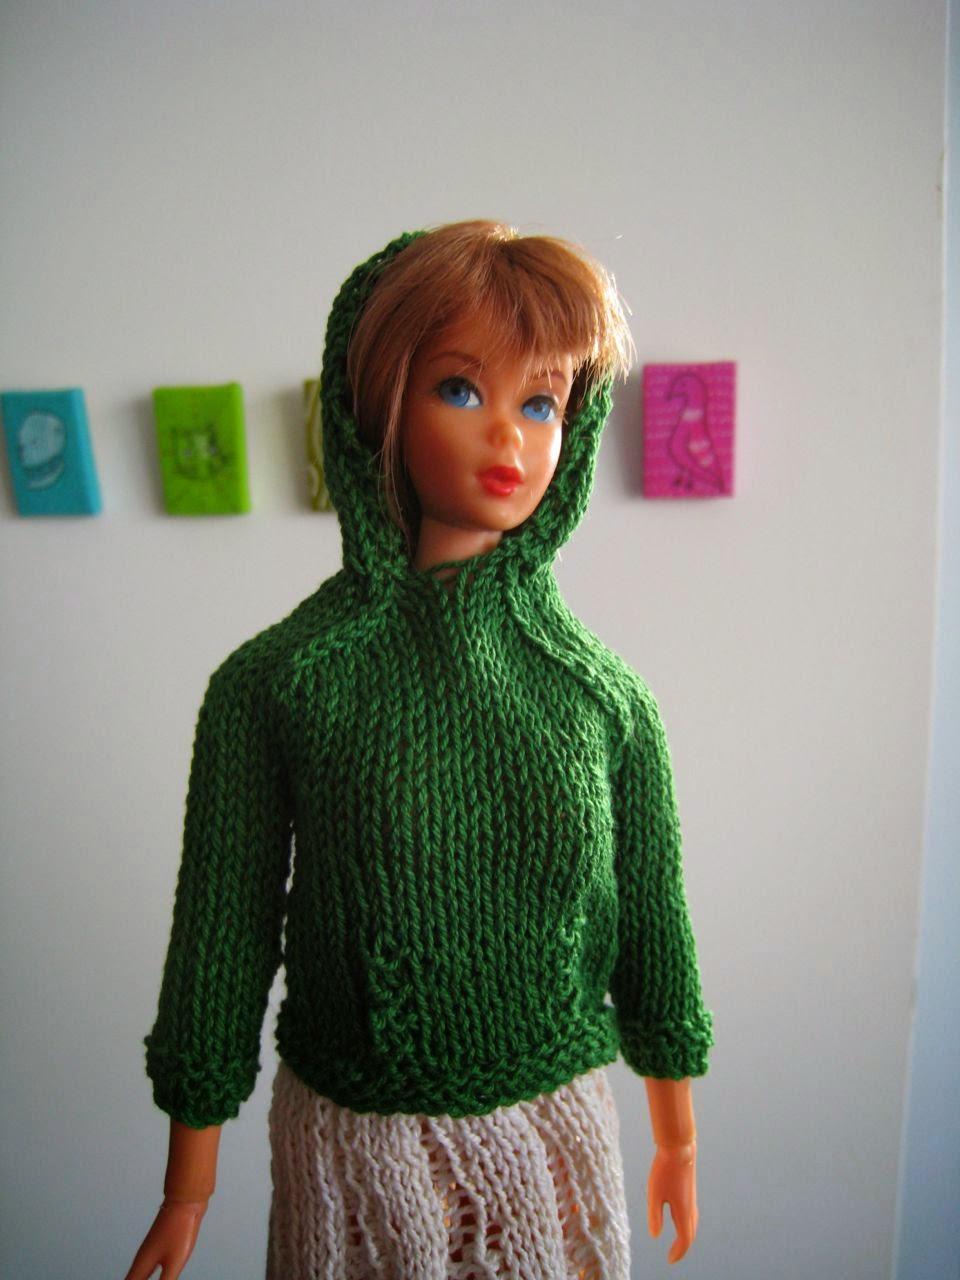 Best Barbie Knits: Barbie Kangaroo Jacket in #10 Crochet ...